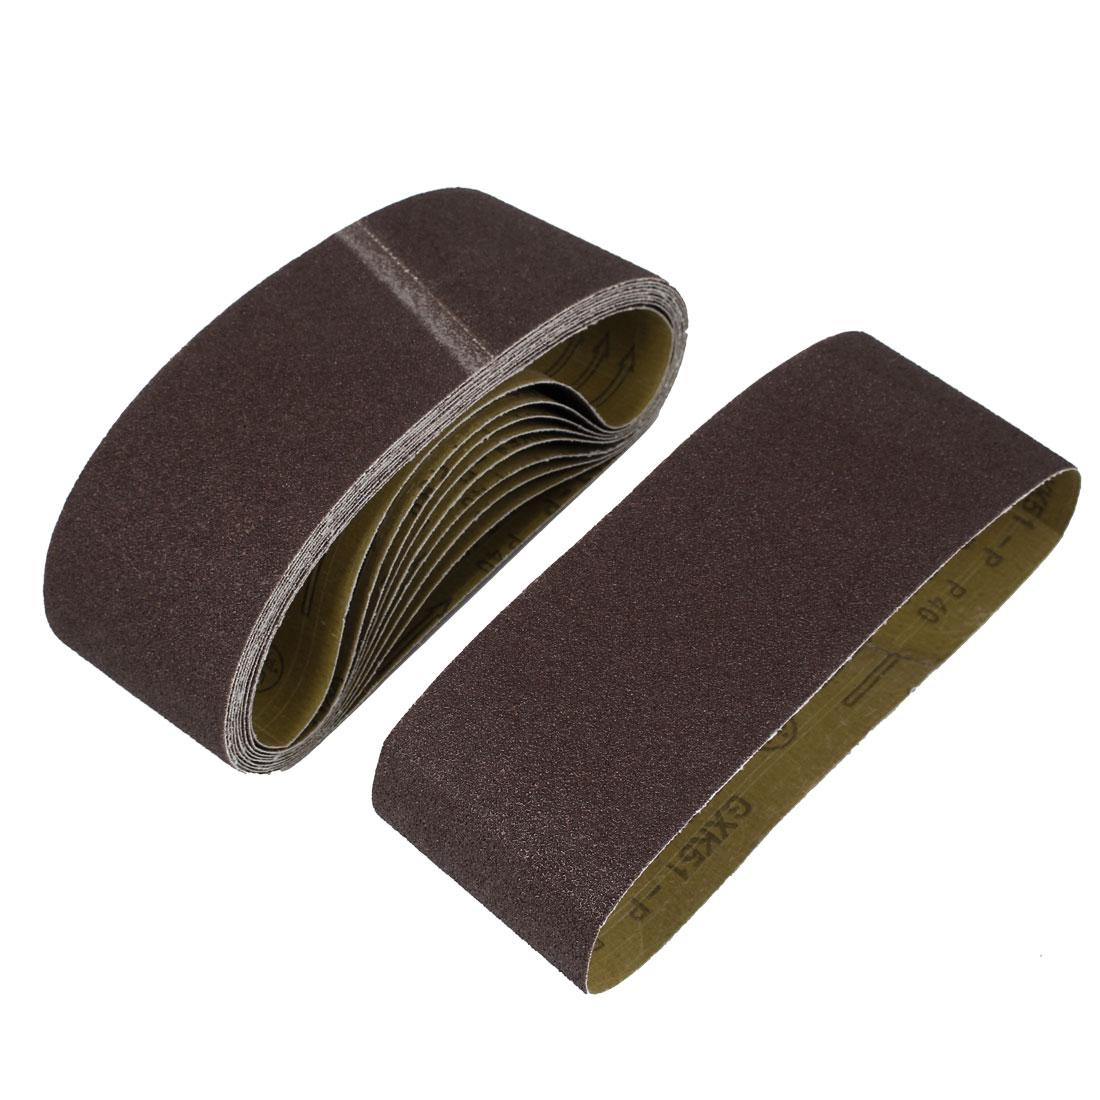 Polishing Machine Woodworking 610x100mm 40 Grit Sanding Abrasive Belt 10pcs